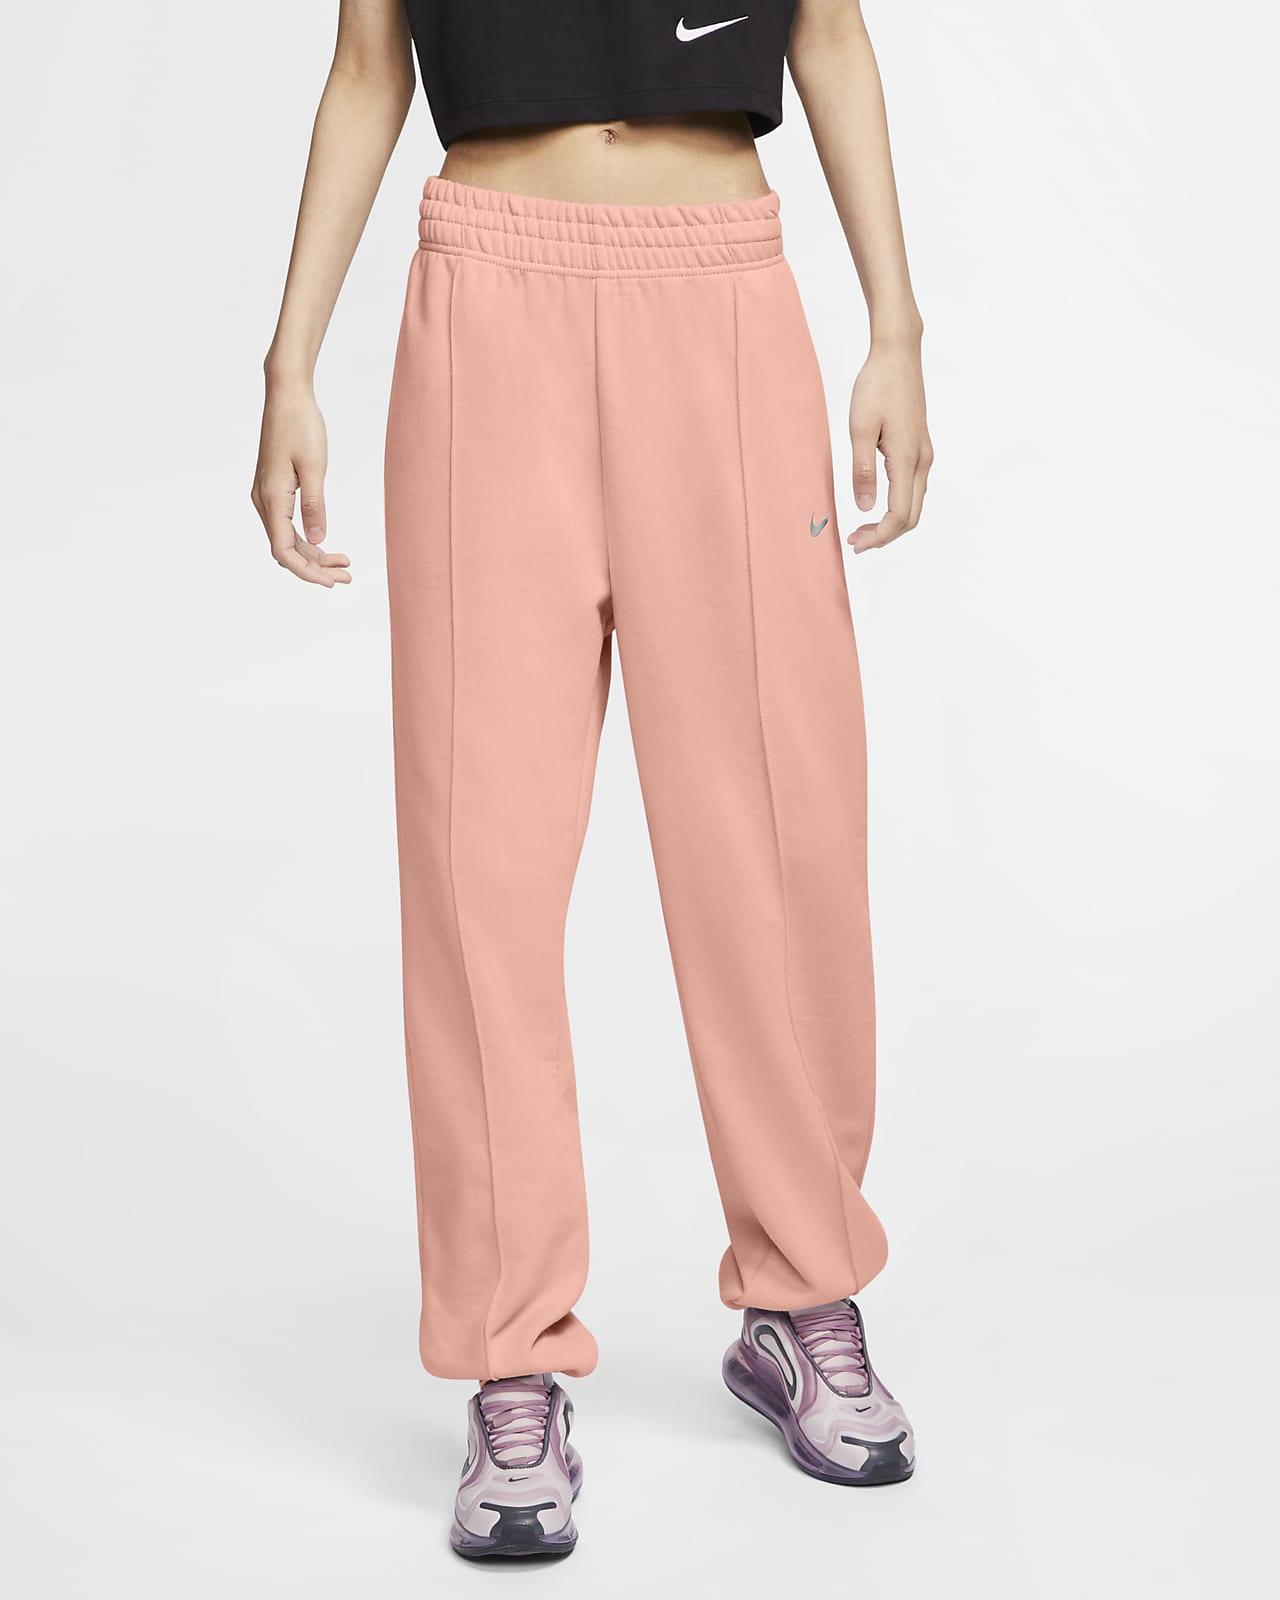 Pantaloni Nike Sportswear - Donna